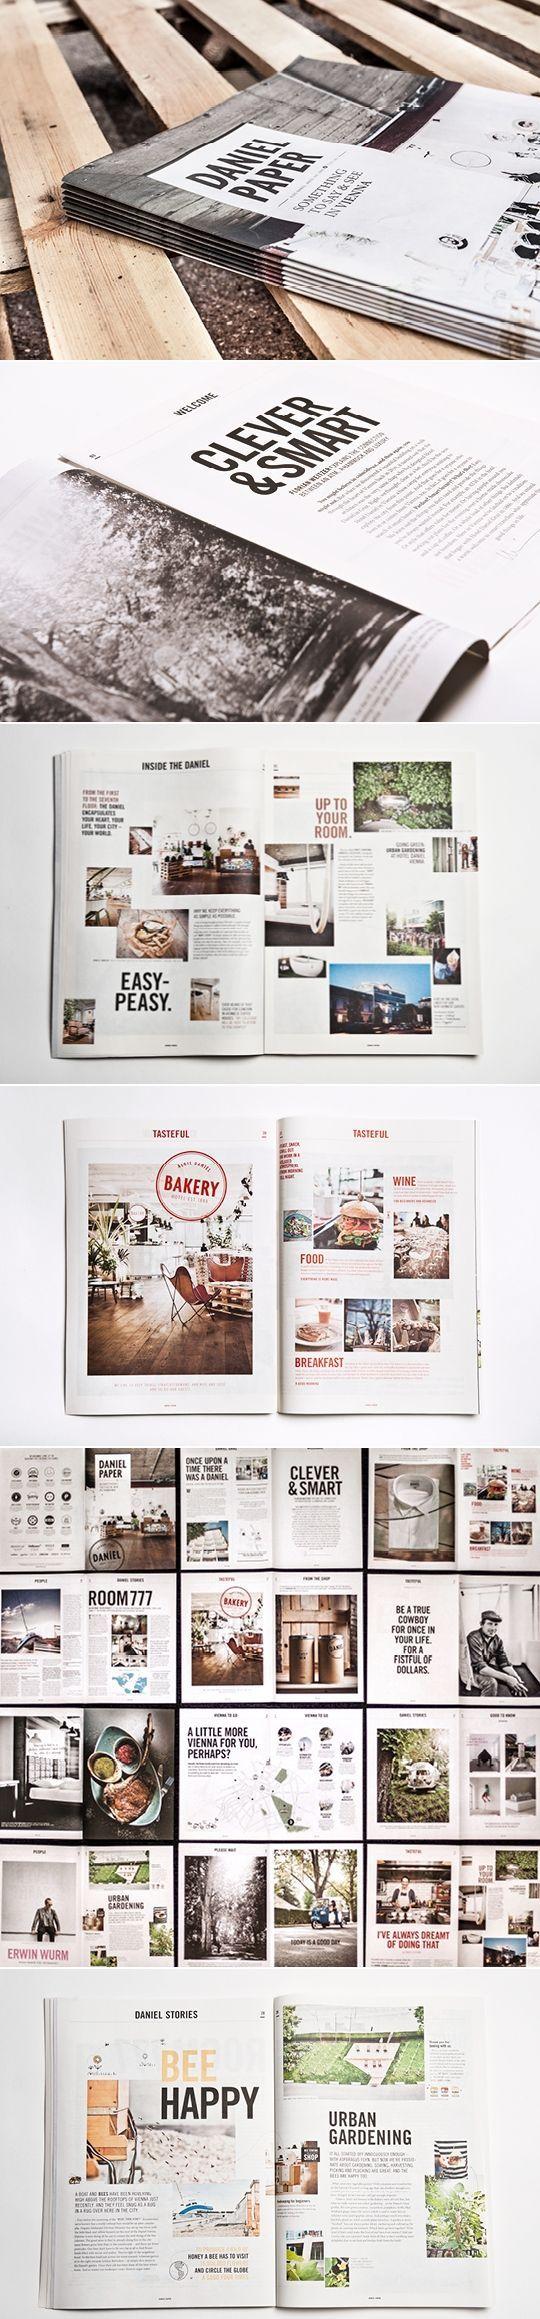 Daniel Paper #layout #design #mag via Behance: